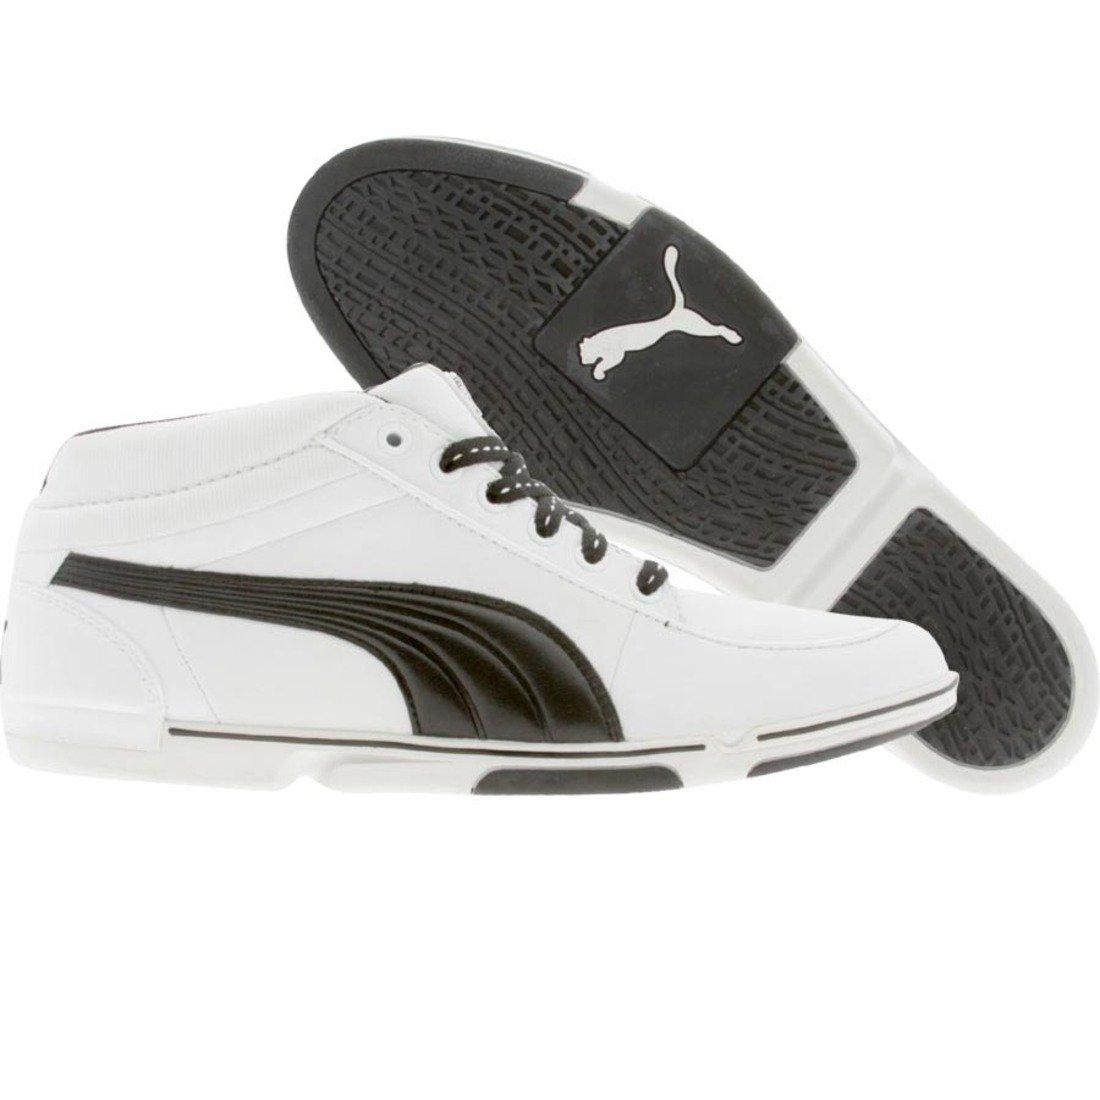 PUMA Unisex 65CC Sneaker,White/Black/White,US Women's 13.5 B/US Men's 12 D by PUMA